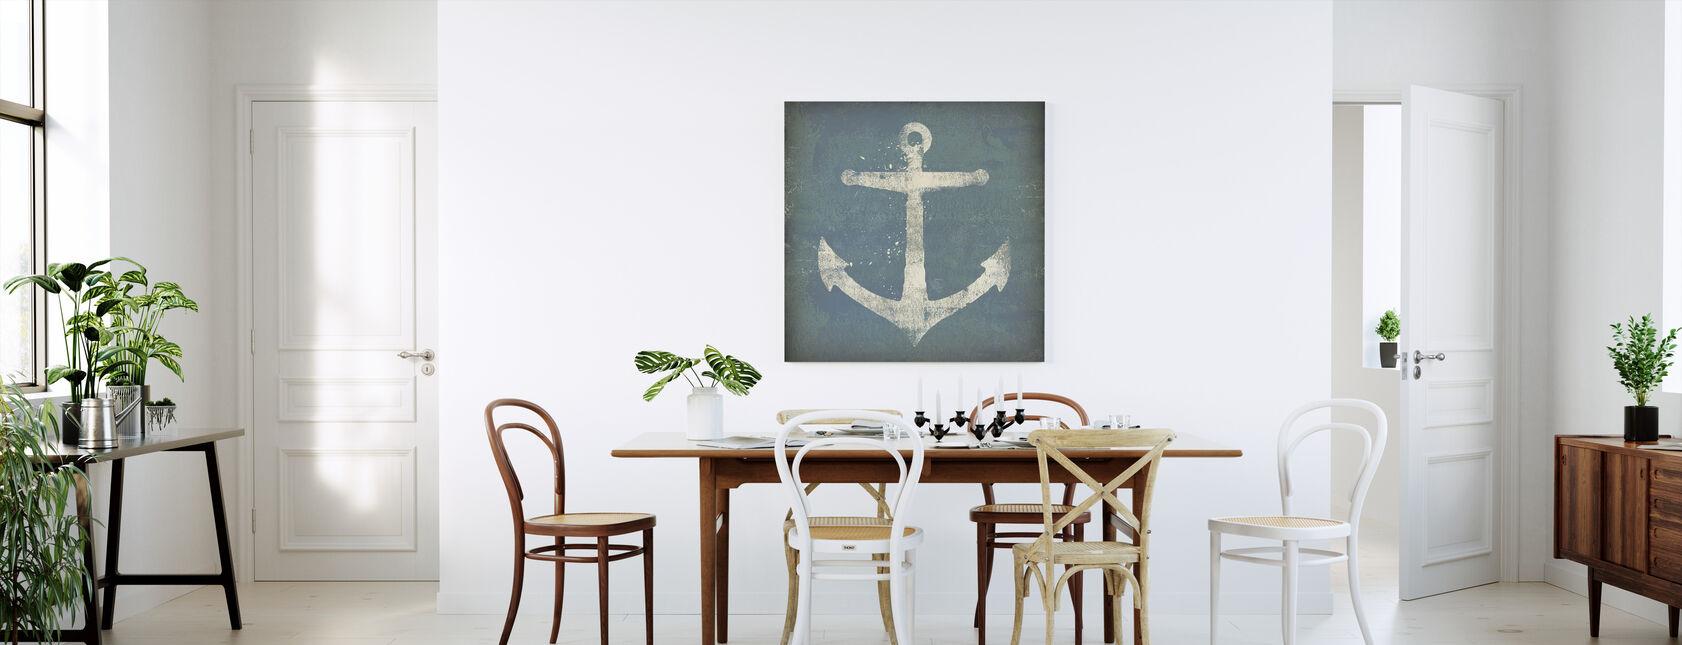 Anker Vierkant - Canvas print - Keuken